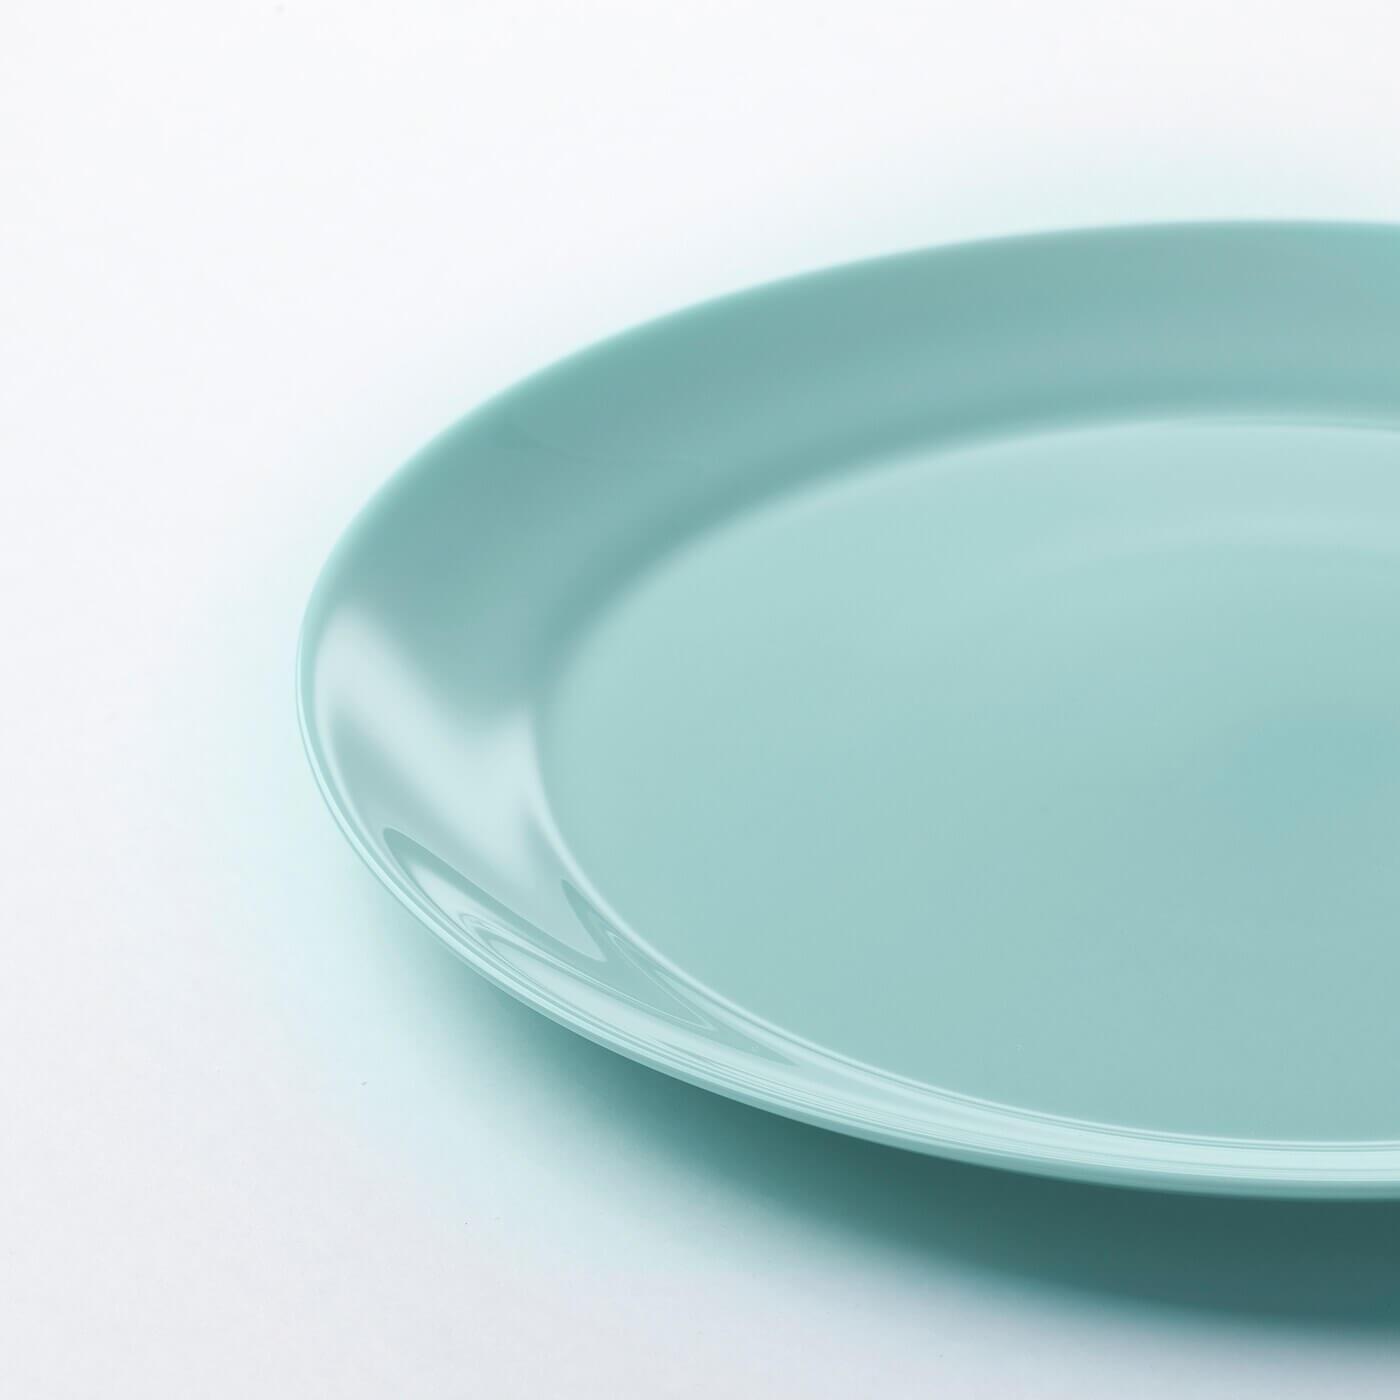 تصویر بشقاب غذاخوری آرکوپال ایکیا مدل BESEGRA (بسته ۴ تایی)